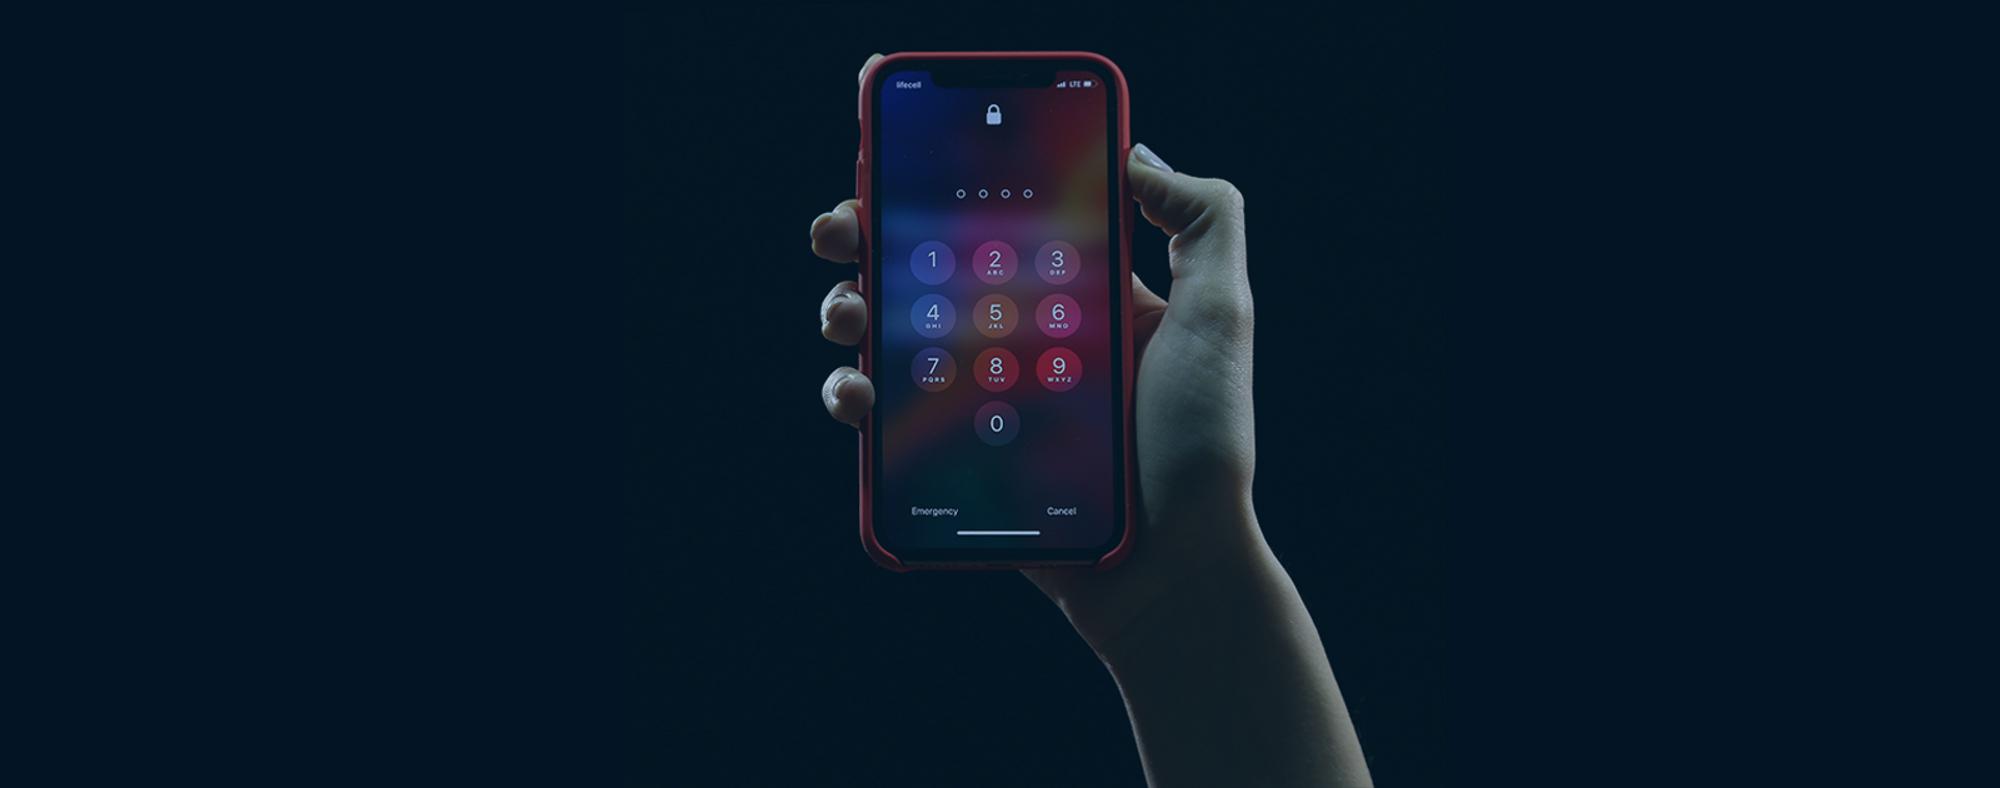 Mobiltelefon i hand.